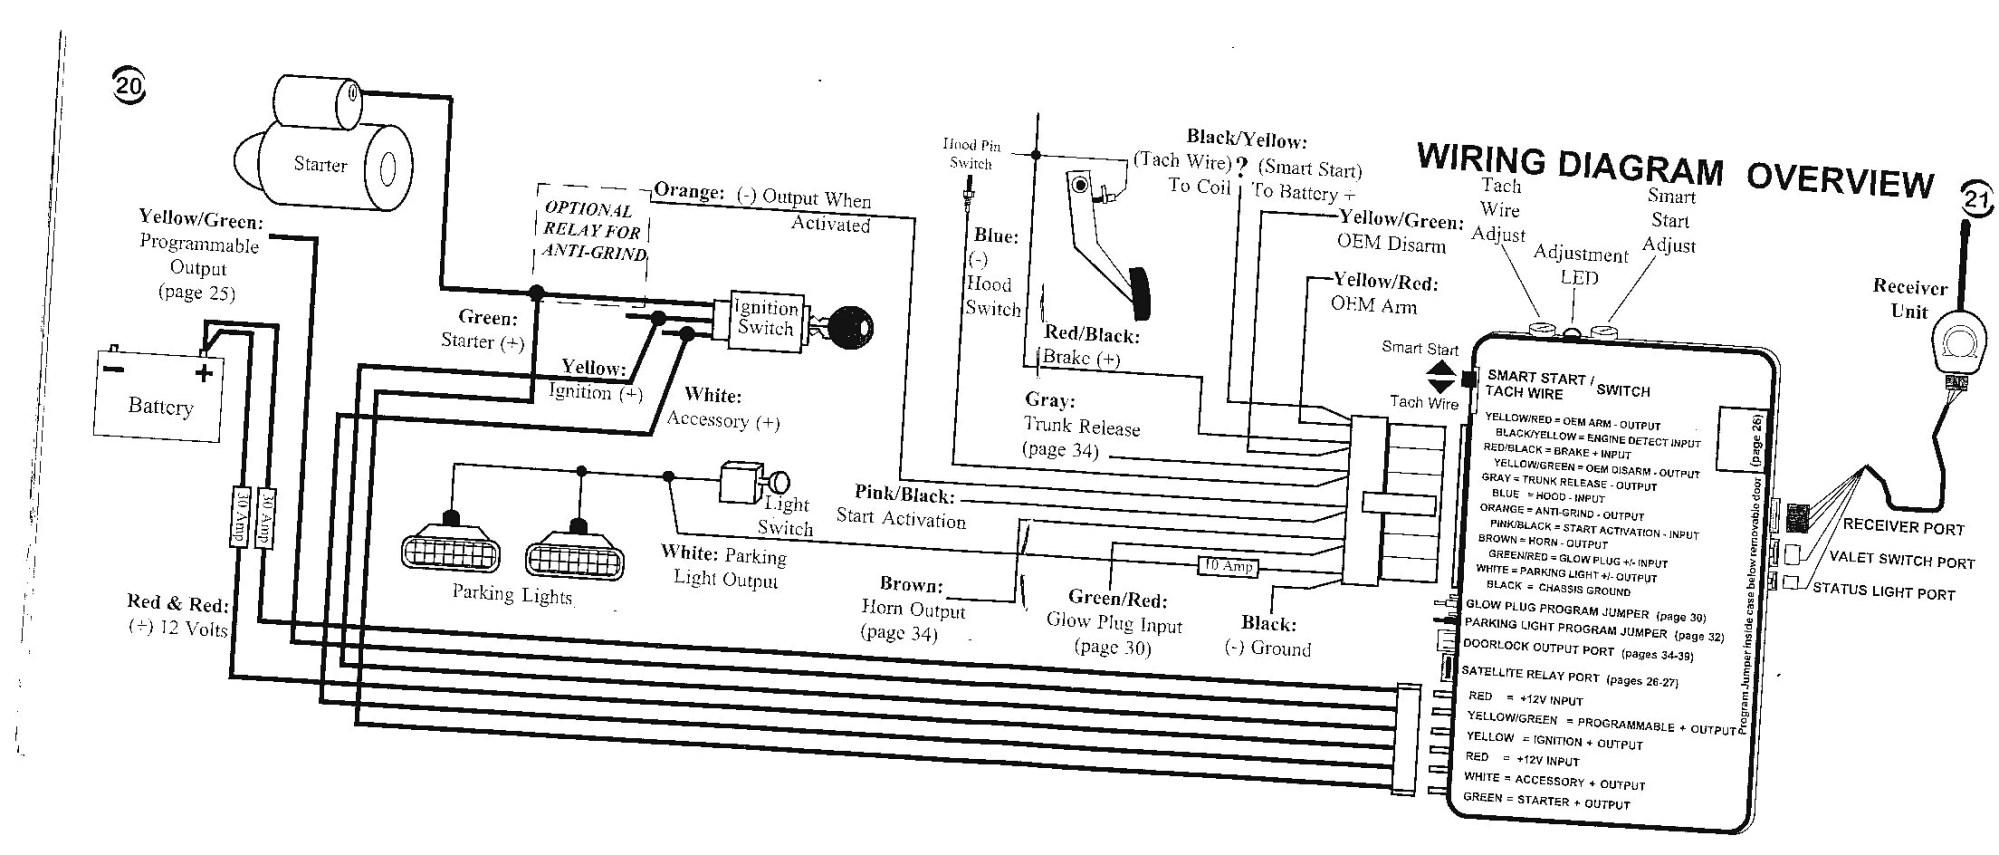 hight resolution of bulldog car alarm wiring diagram viper 771xv wiring diagram tech support forum brilliant car alarm of